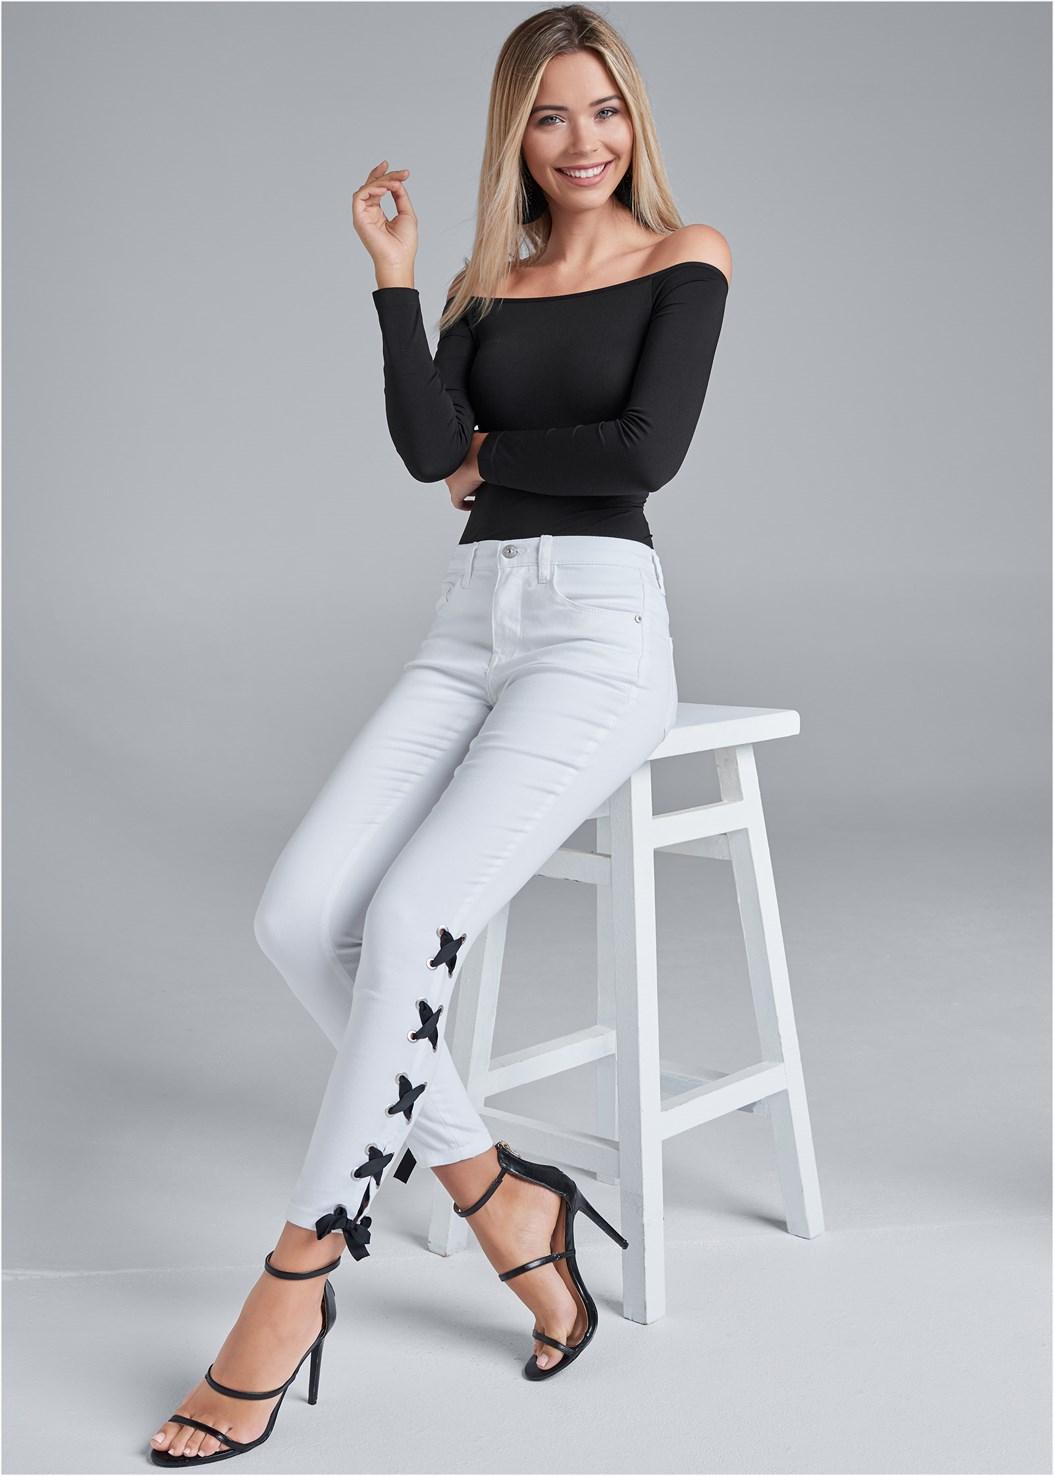 Lace Up Detail Jeans,Off The Shoulder Top,High Heel Strappy Sandals,Flower Detail Heels,Beaded Tassel Earrings